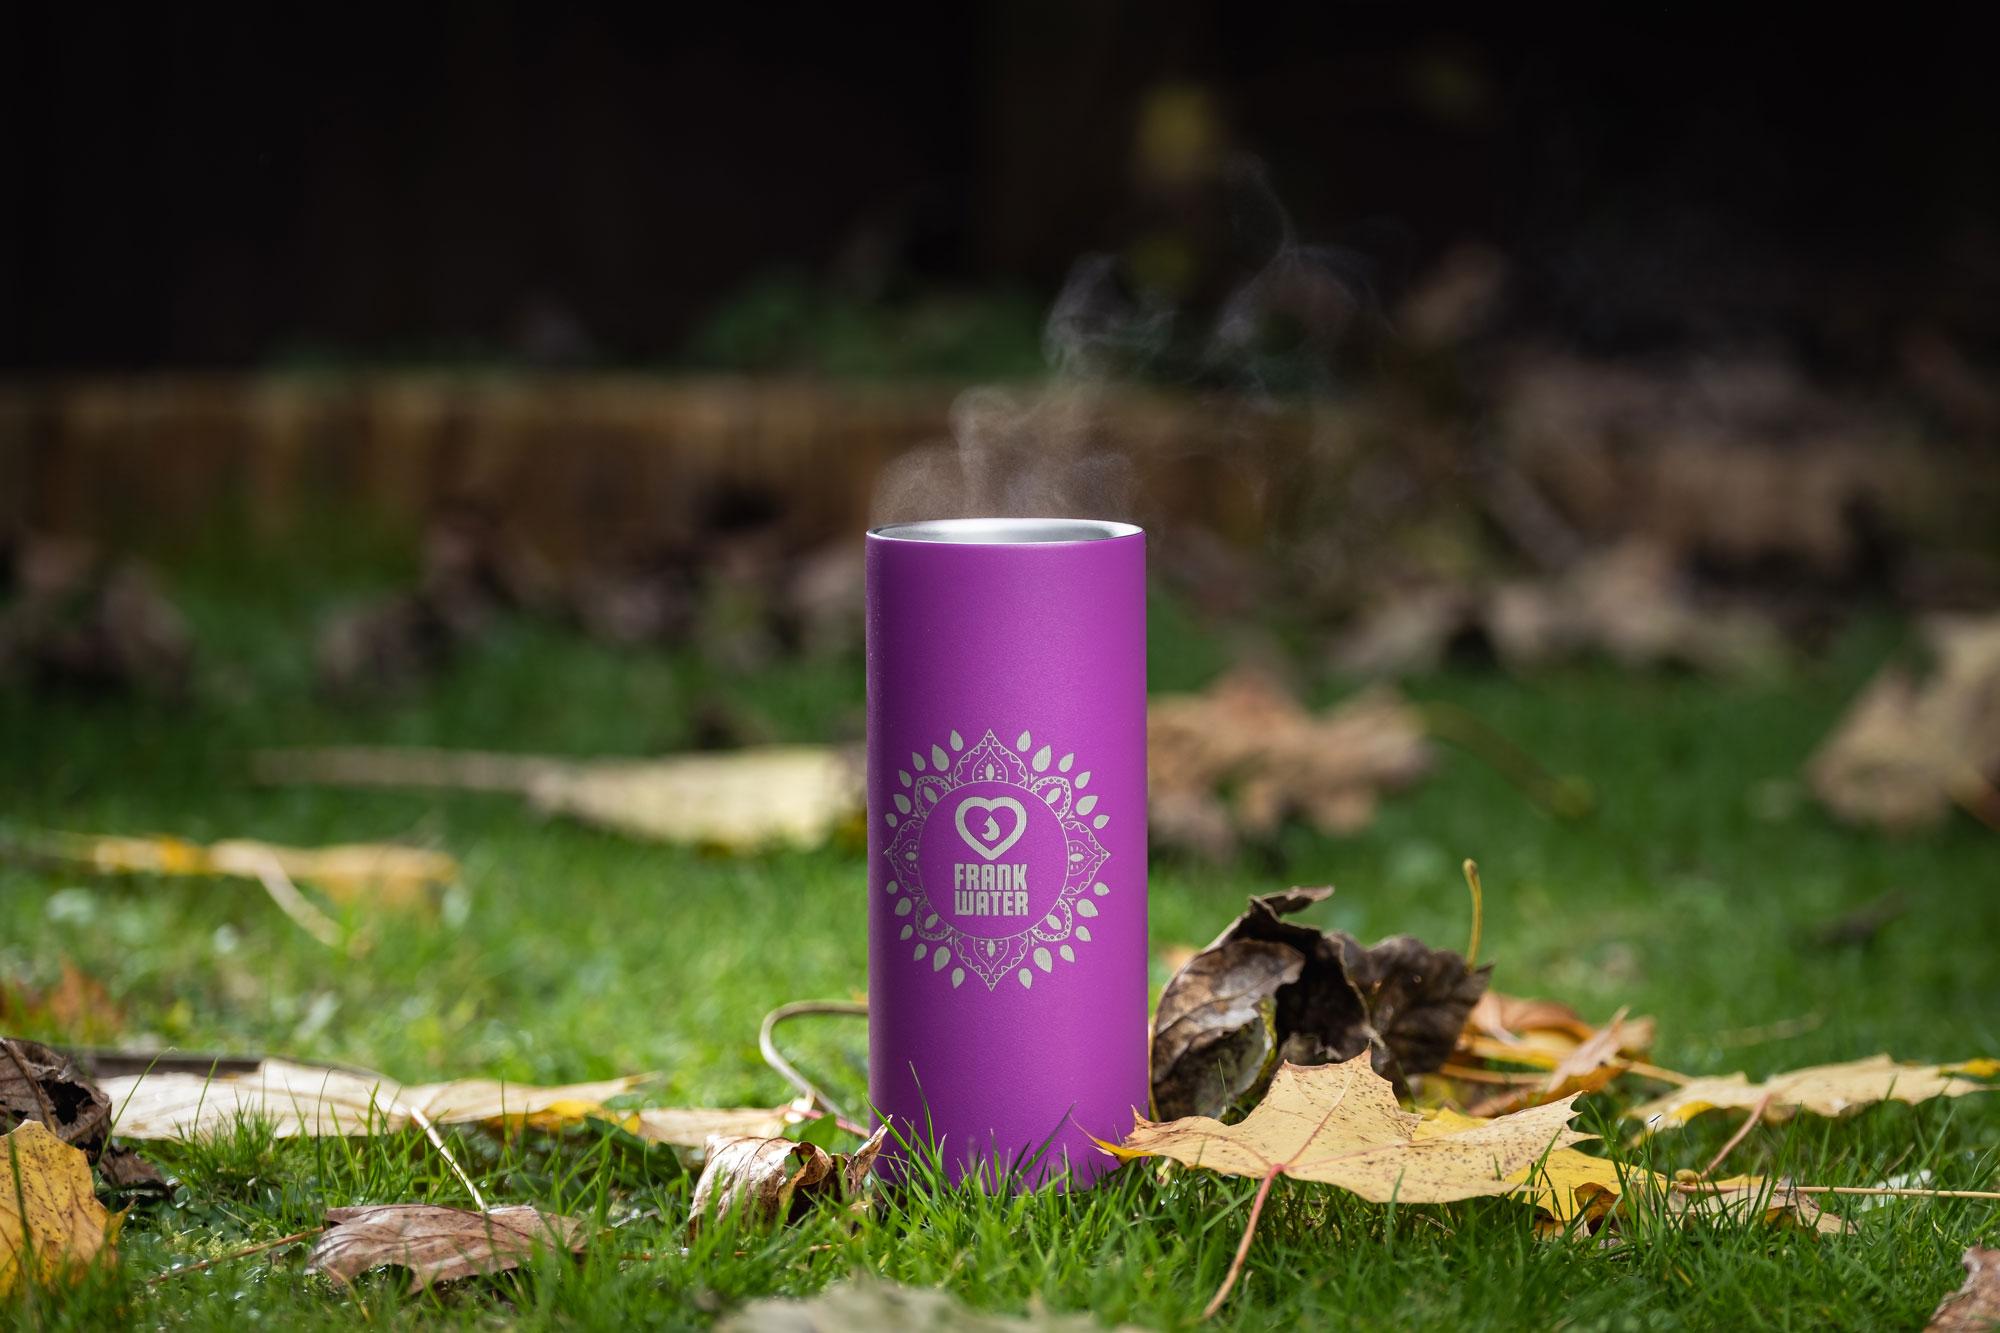 Frank Water Klean Kanteen Purple Coffee Cup keeping warm